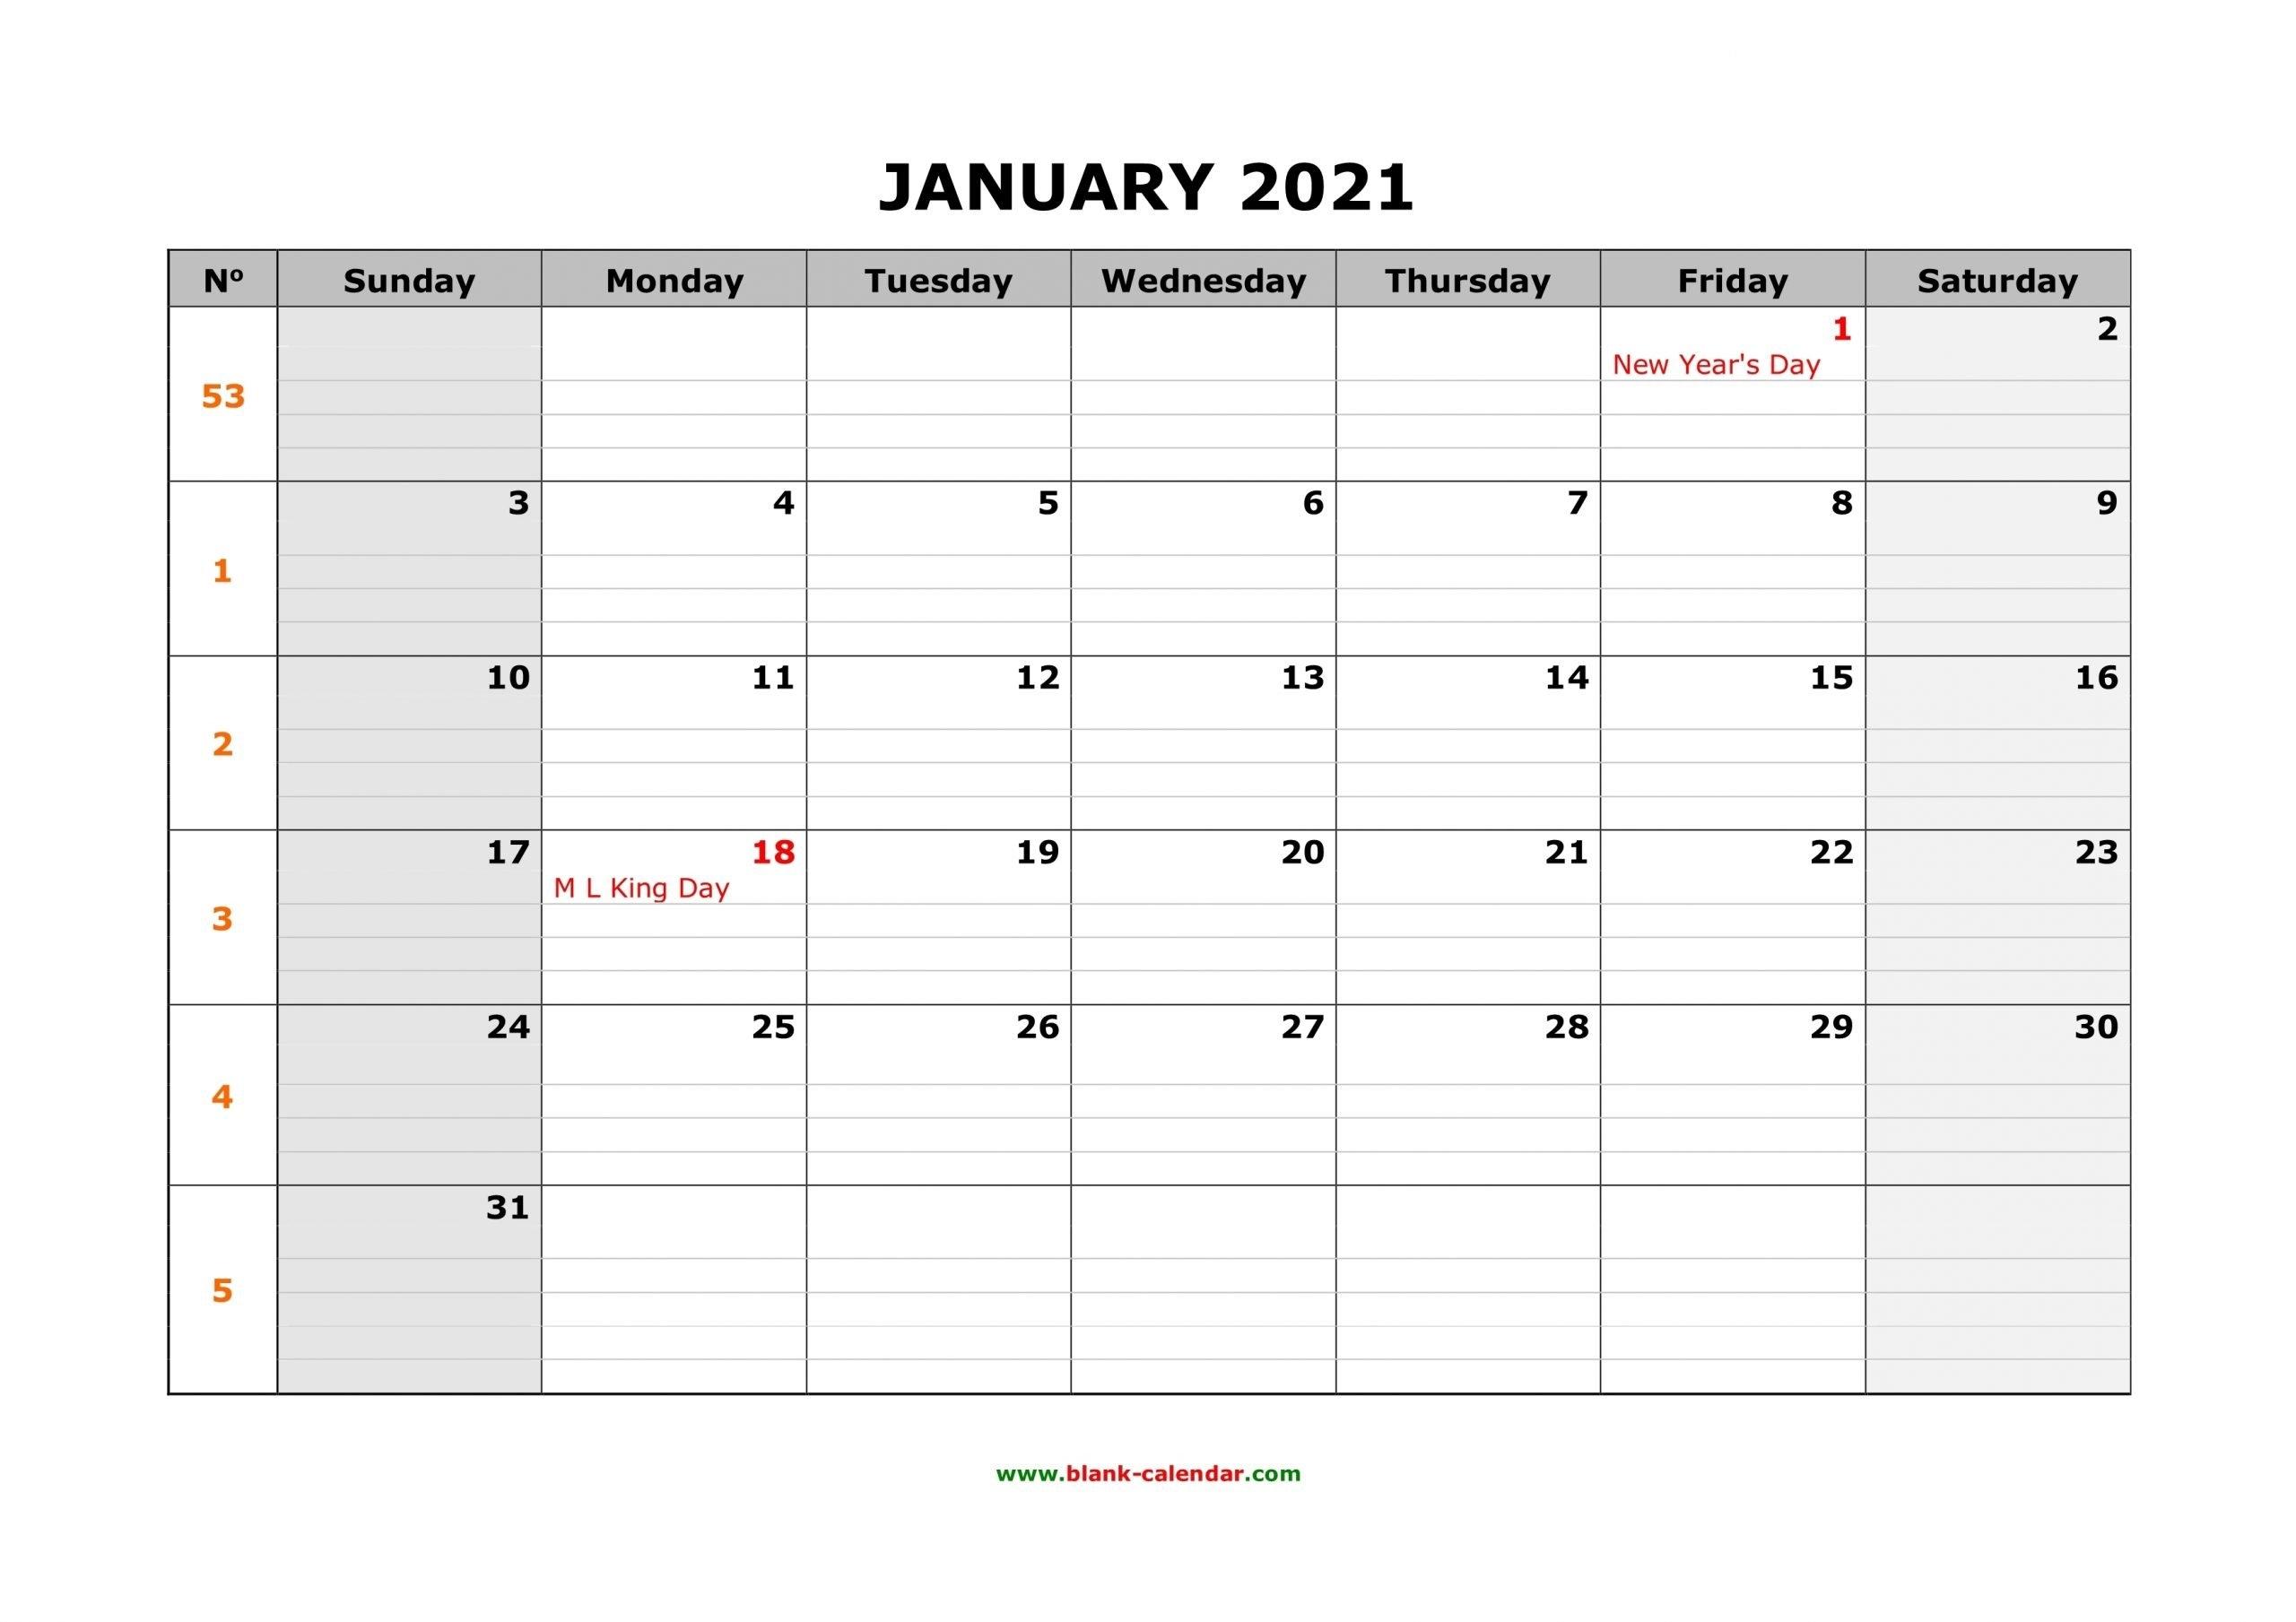 Kuda 2021 Calender | Month Calendar Printable regarding Calendar Kuda 2021 Download Photo